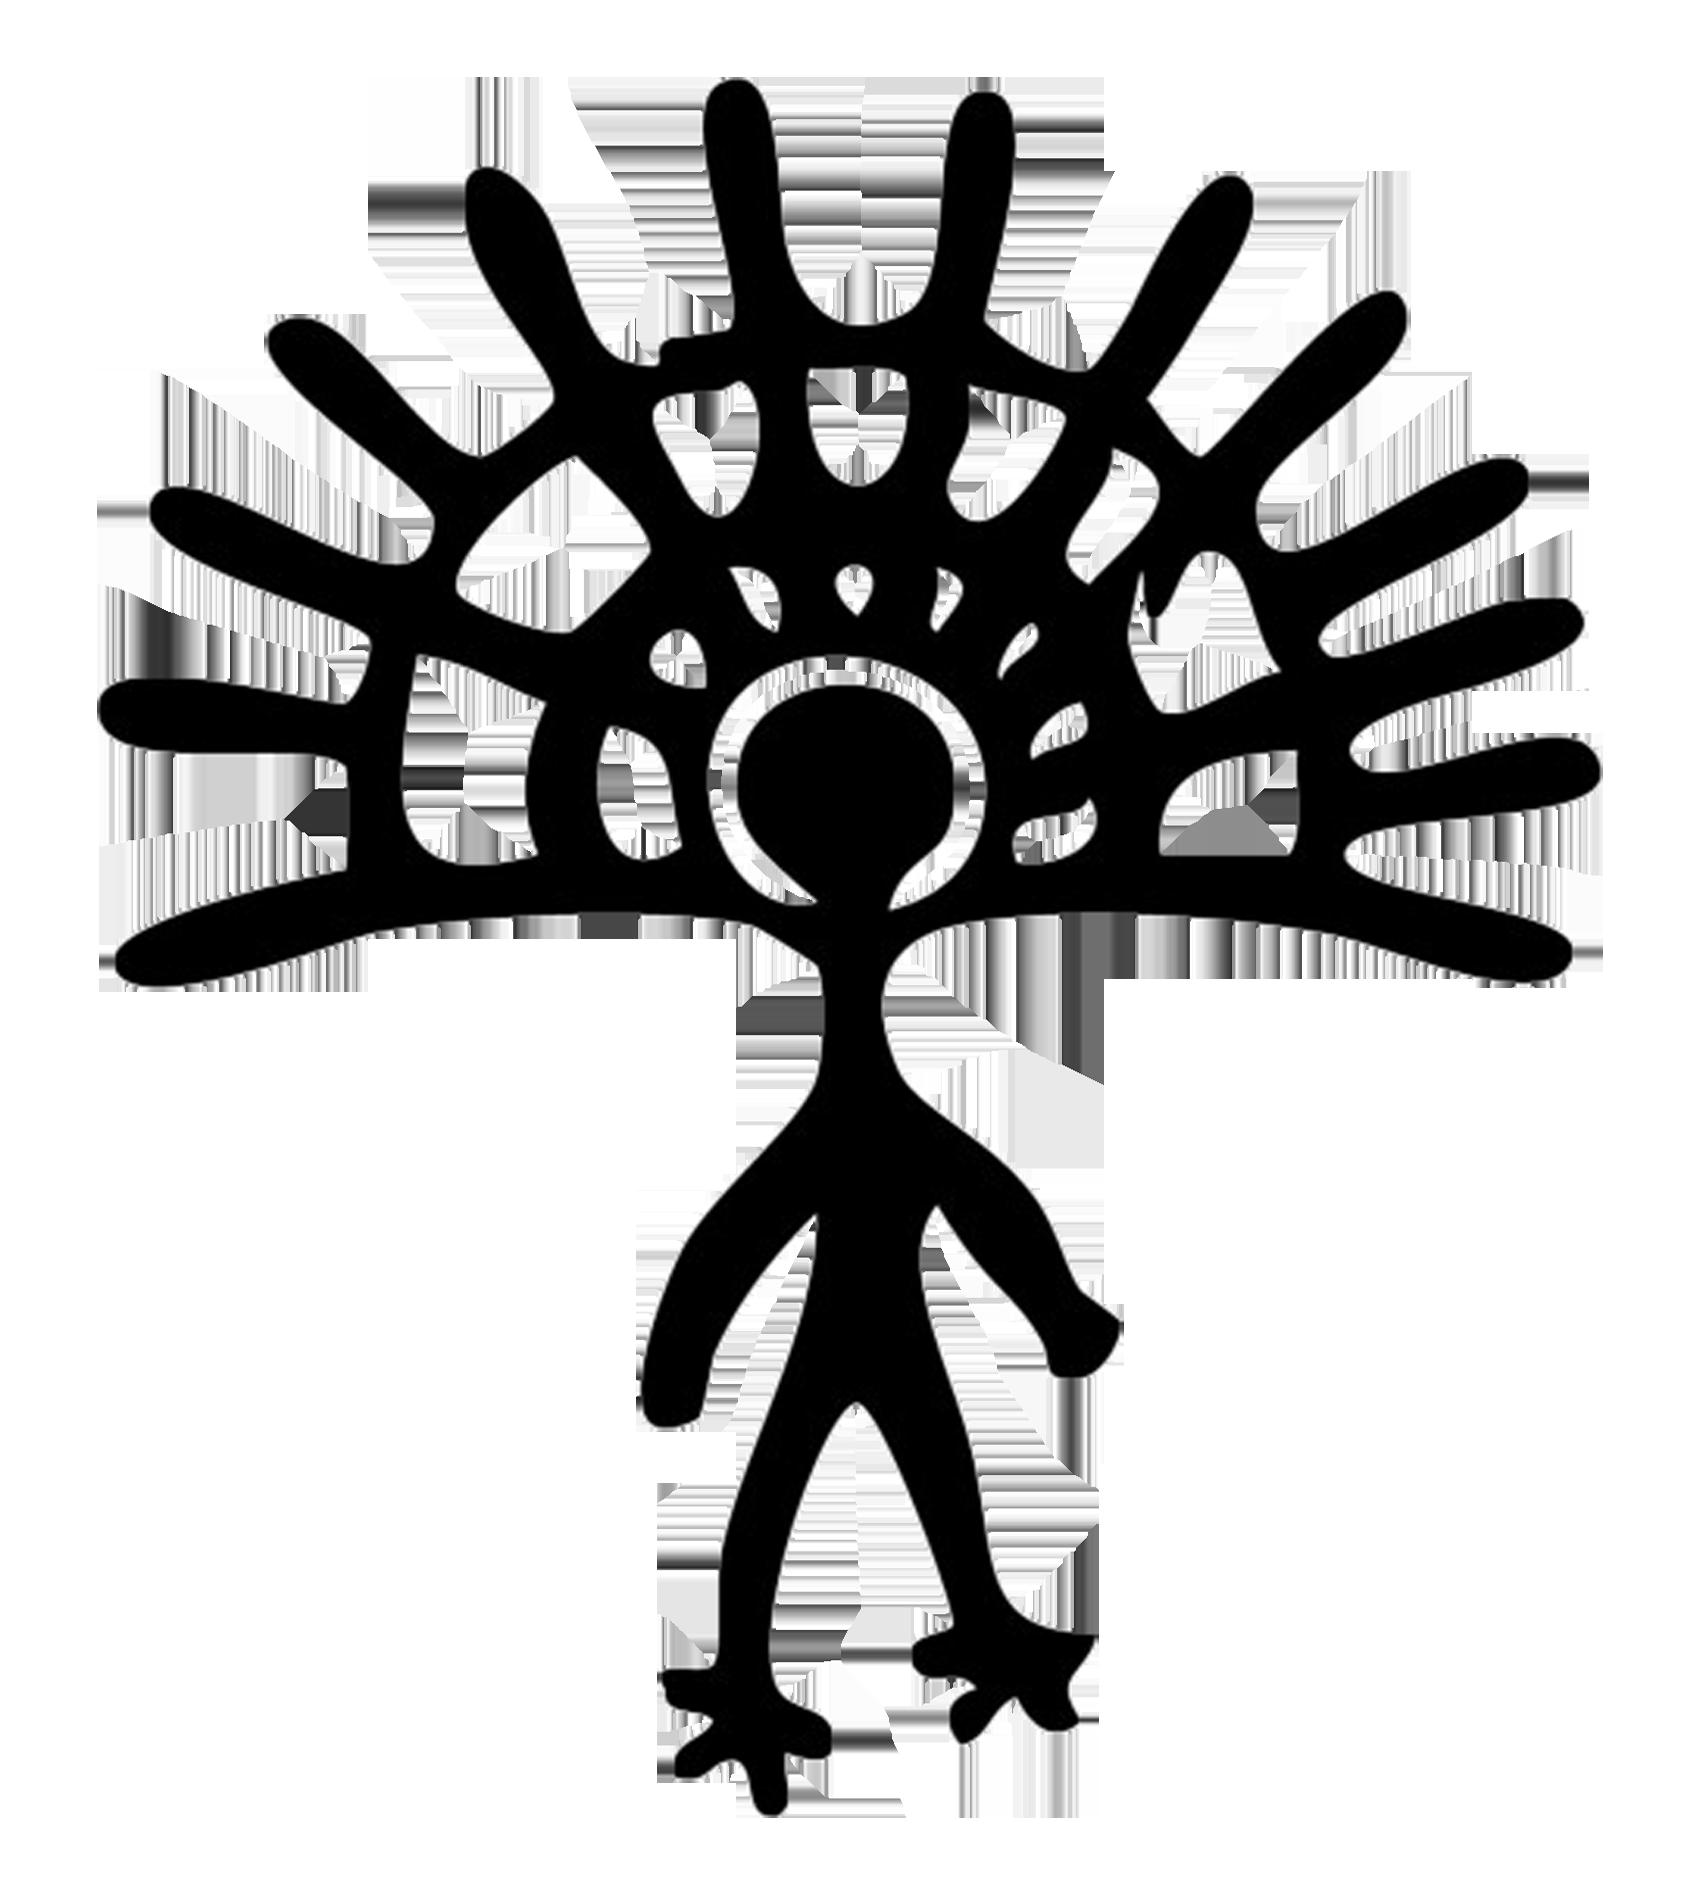 Free hawaiian petroglyphs clipart picture free library Free Hawaiian Petroglyphs Clipart, Download Free Clip Art, Free Clip ... picture free library